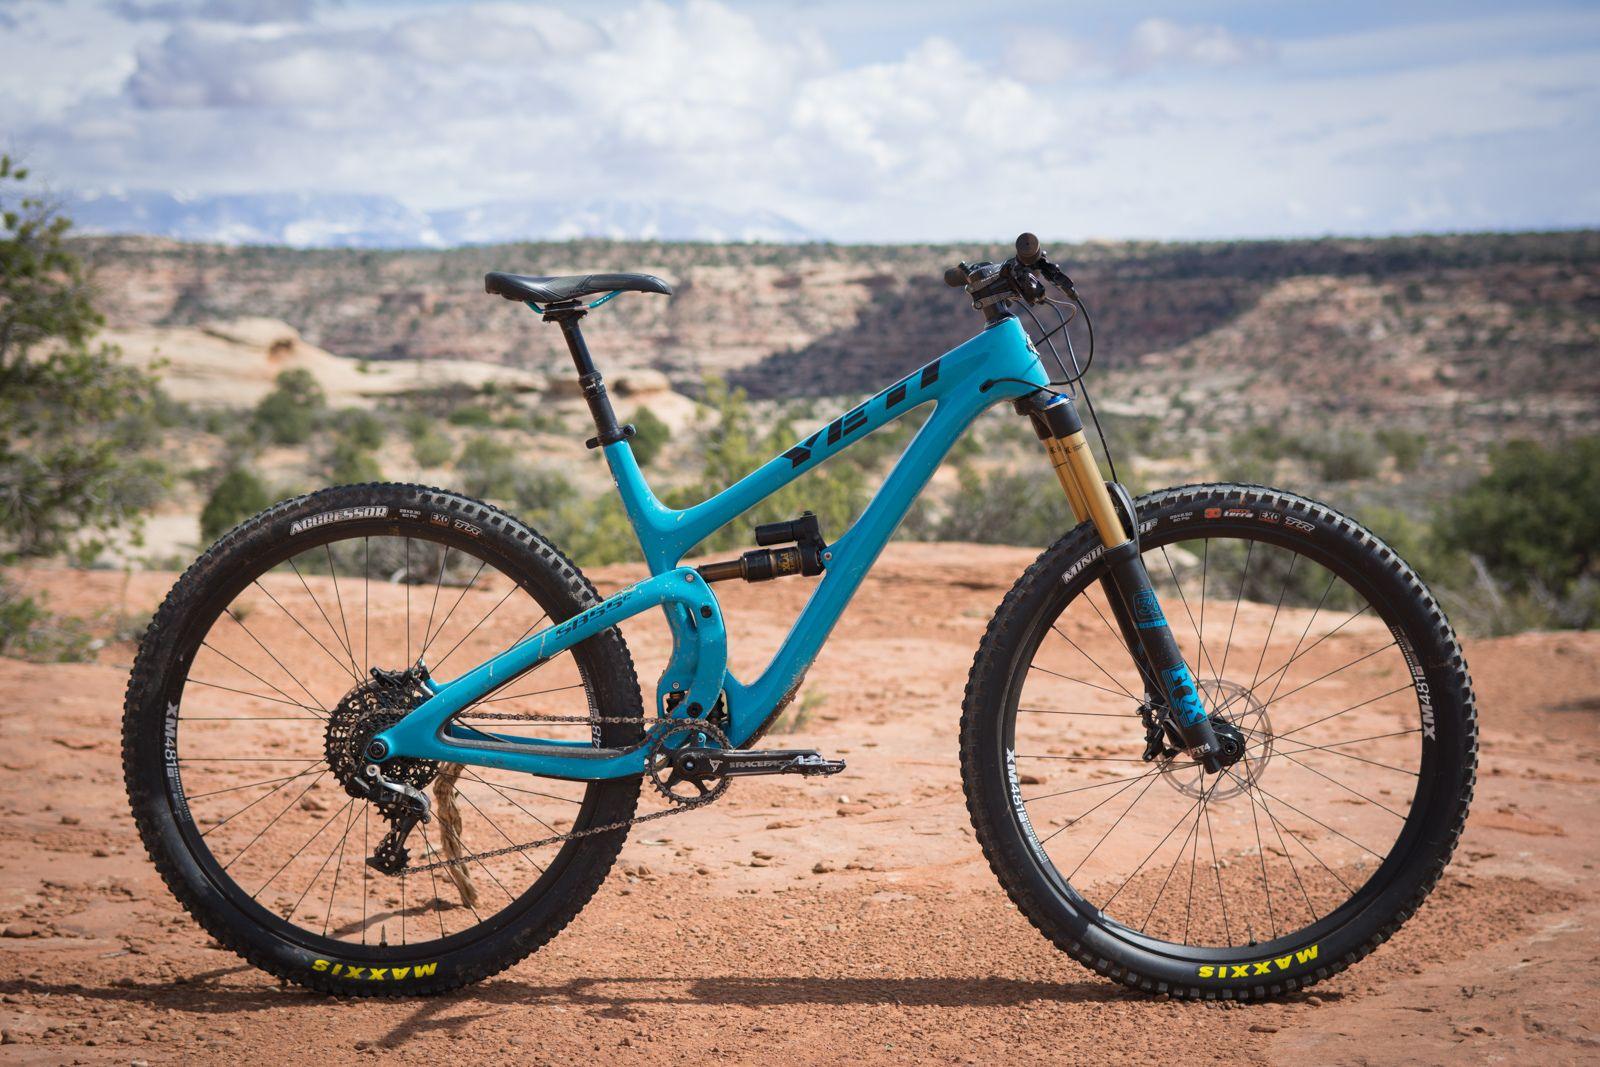 Yeti Sb5 5c First Ride Bike Ride Mountian Bike Downhill Bike